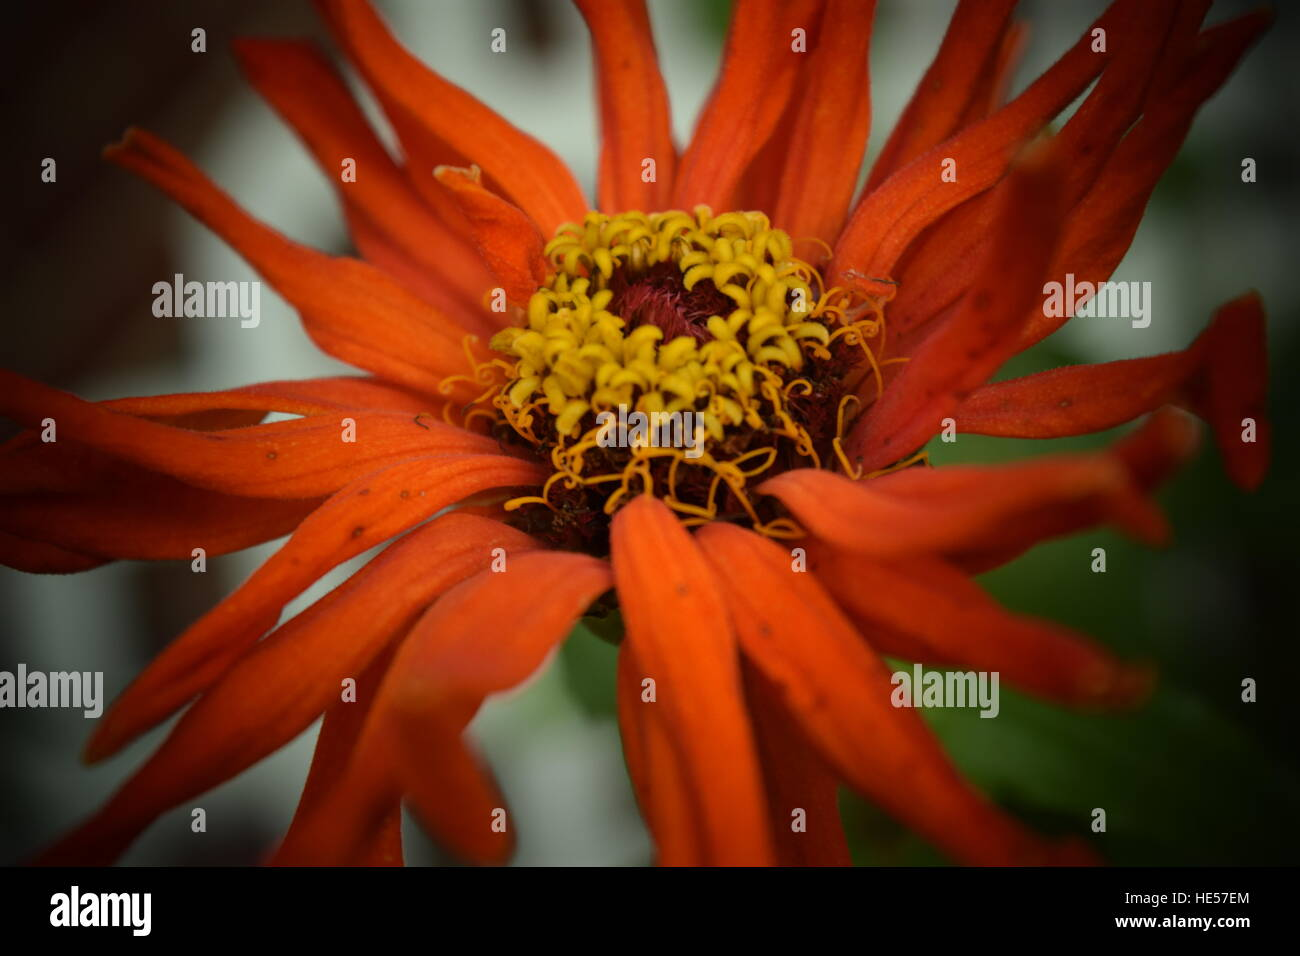 Orange Zinnia Flower With Yellow Center Stock Photos Orange Zinnia